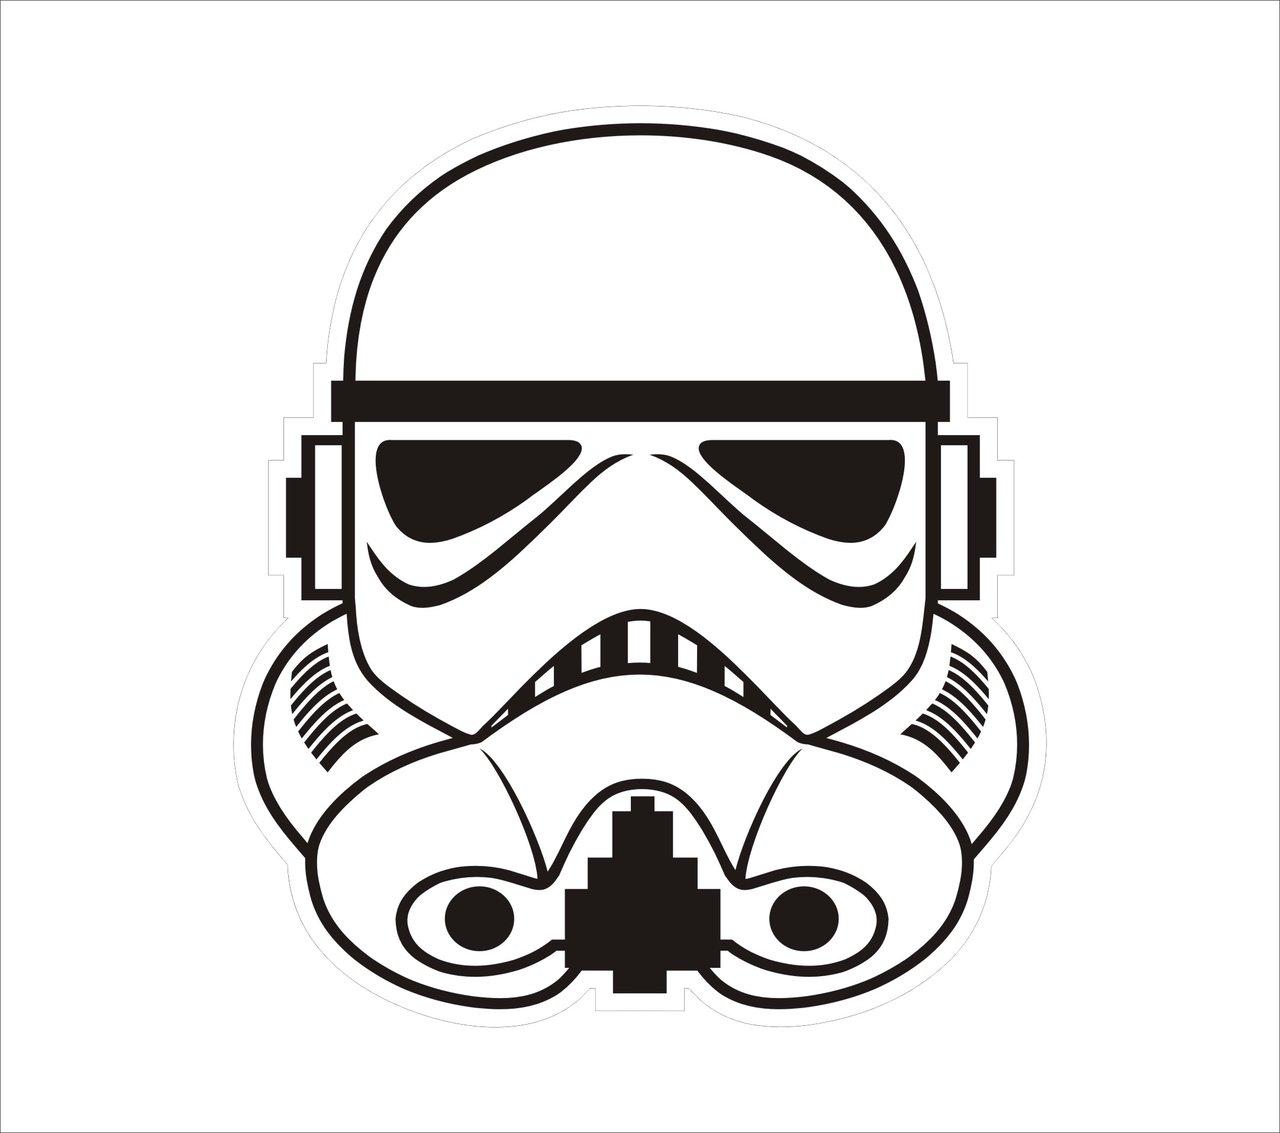 Stormtrooper Clipart Clipart Best-Stormtrooper Clipart Clipart Best-0